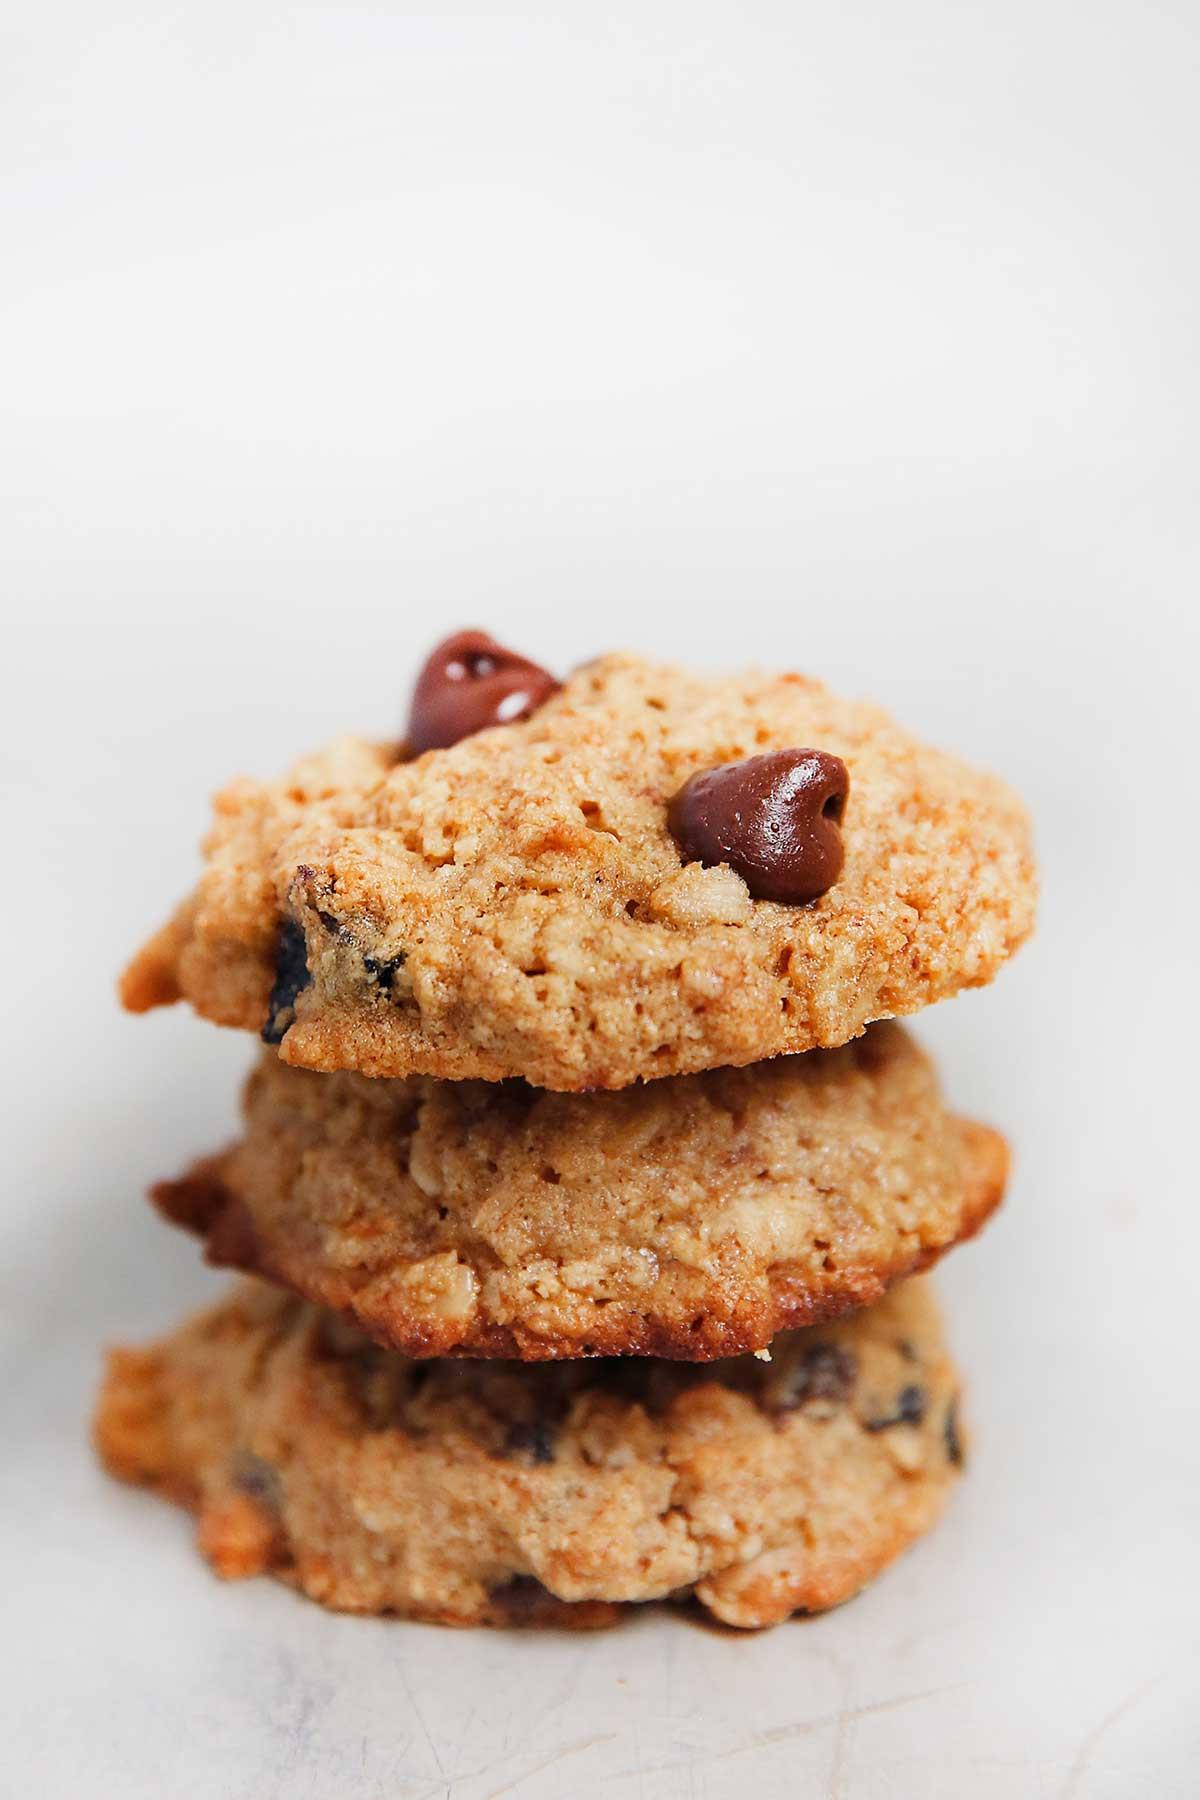 Gluten Free Oatmeal Raisin Cookies  Oatmeal Raisin Chocolate Chip Cookies Lexi s Clean Kitchen